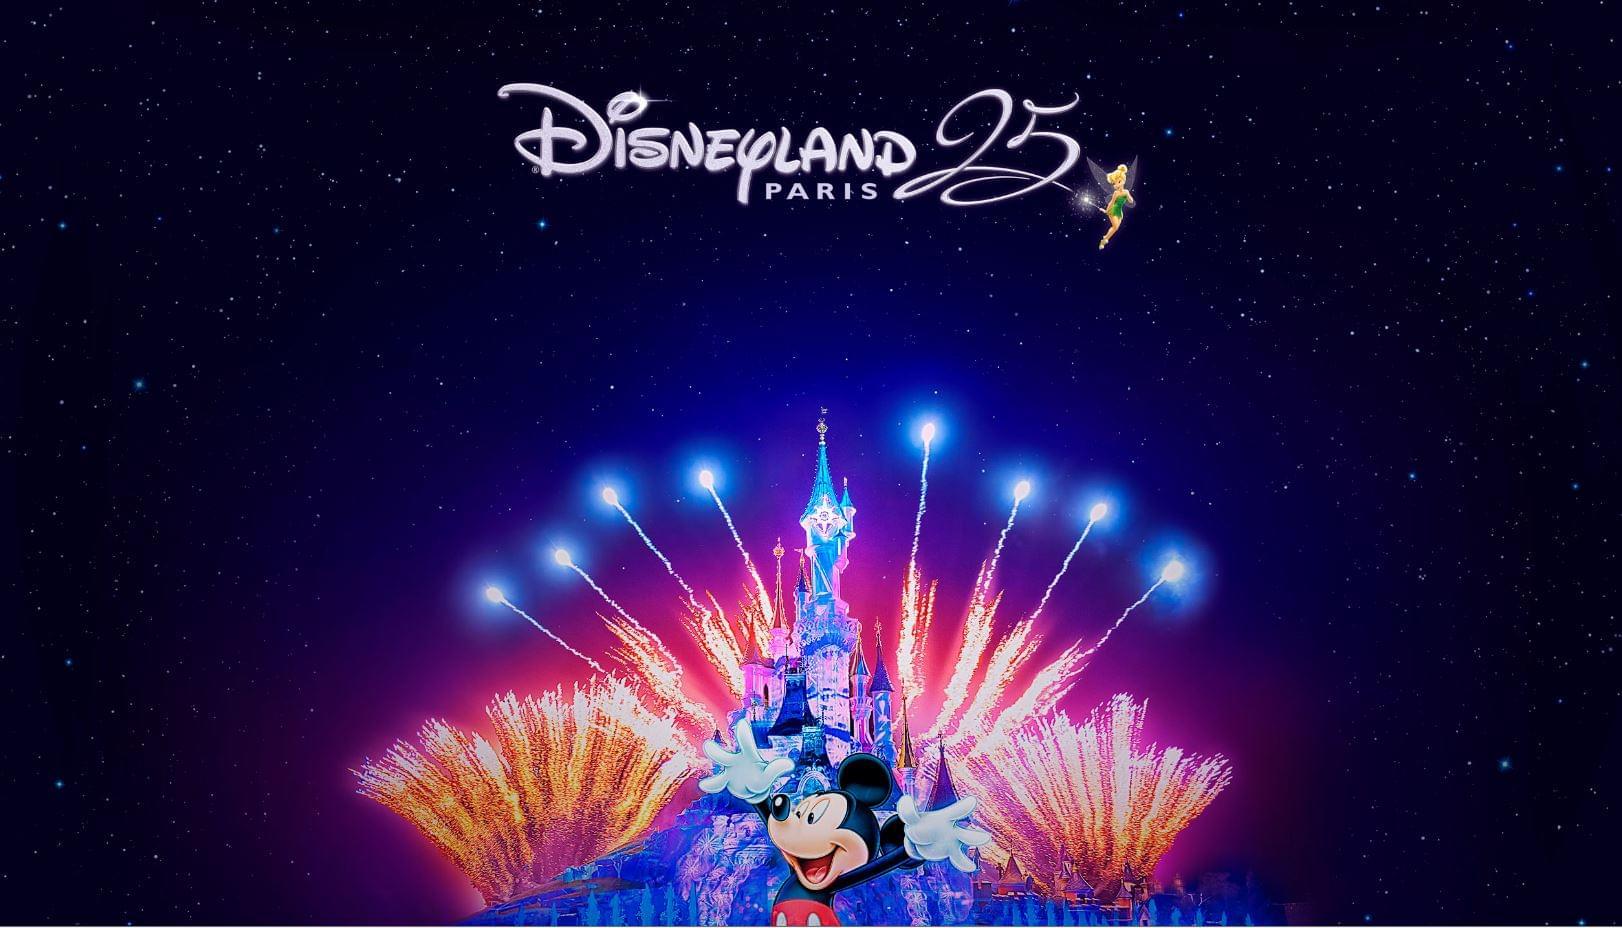 Disneyland Parijs - copyright ©Disney